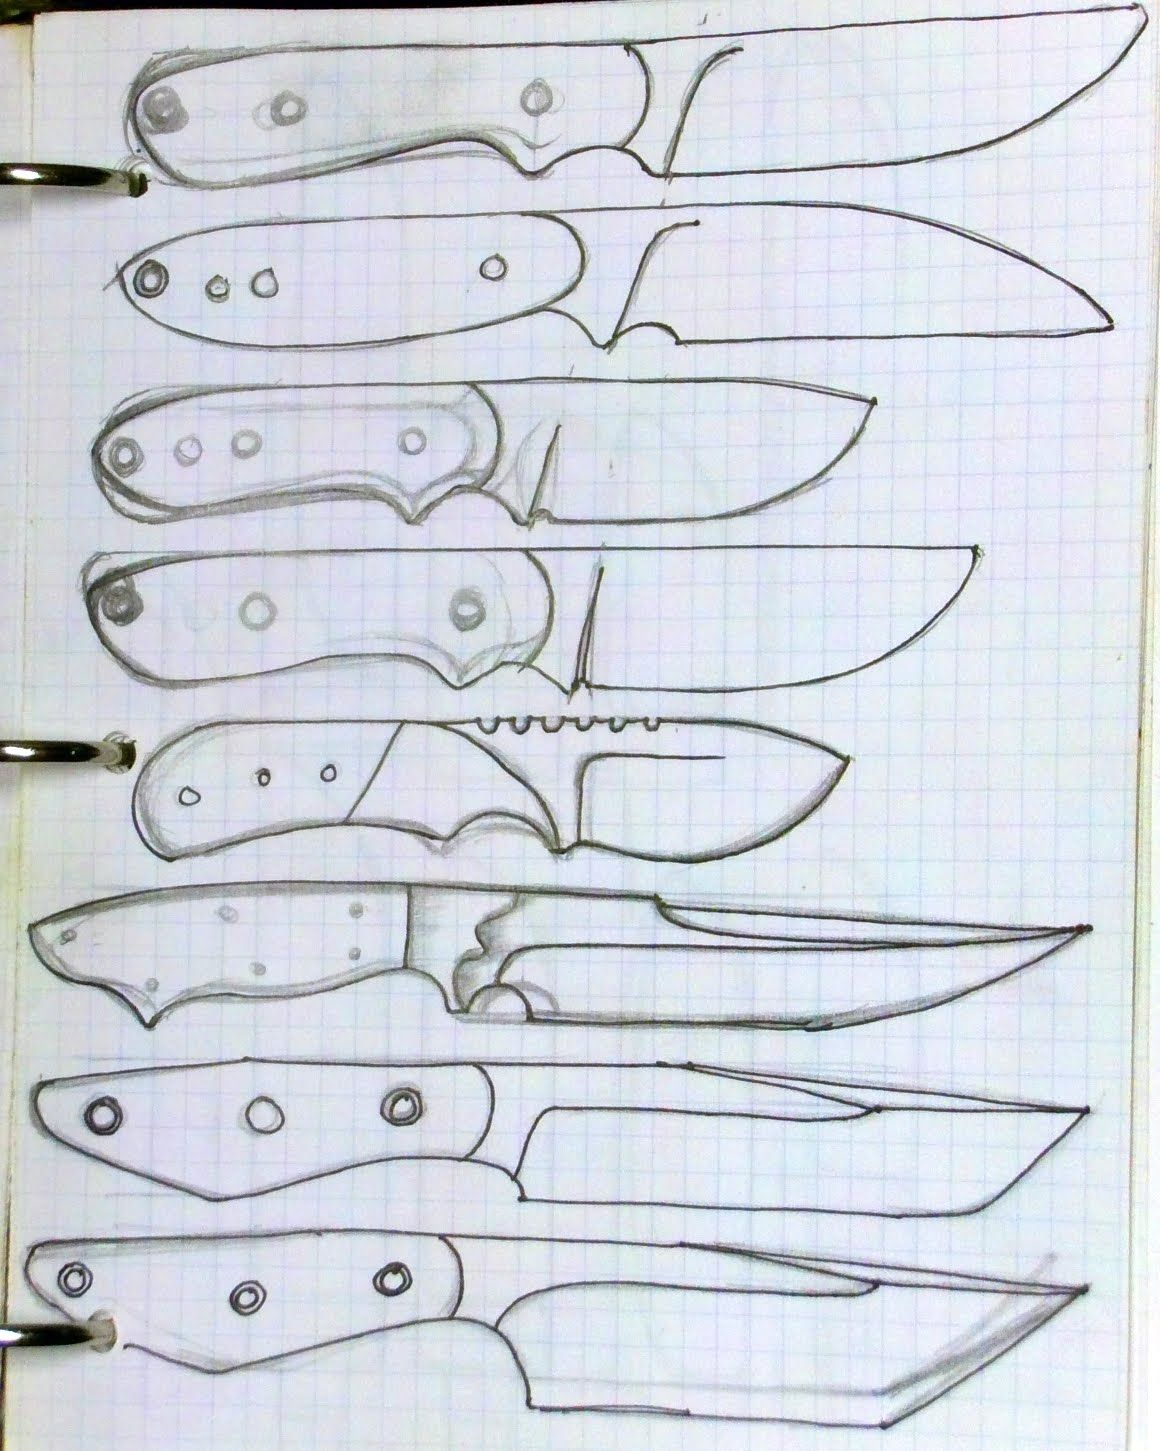 Knife Designs Silent Version Youtube Knife Patterns Knife